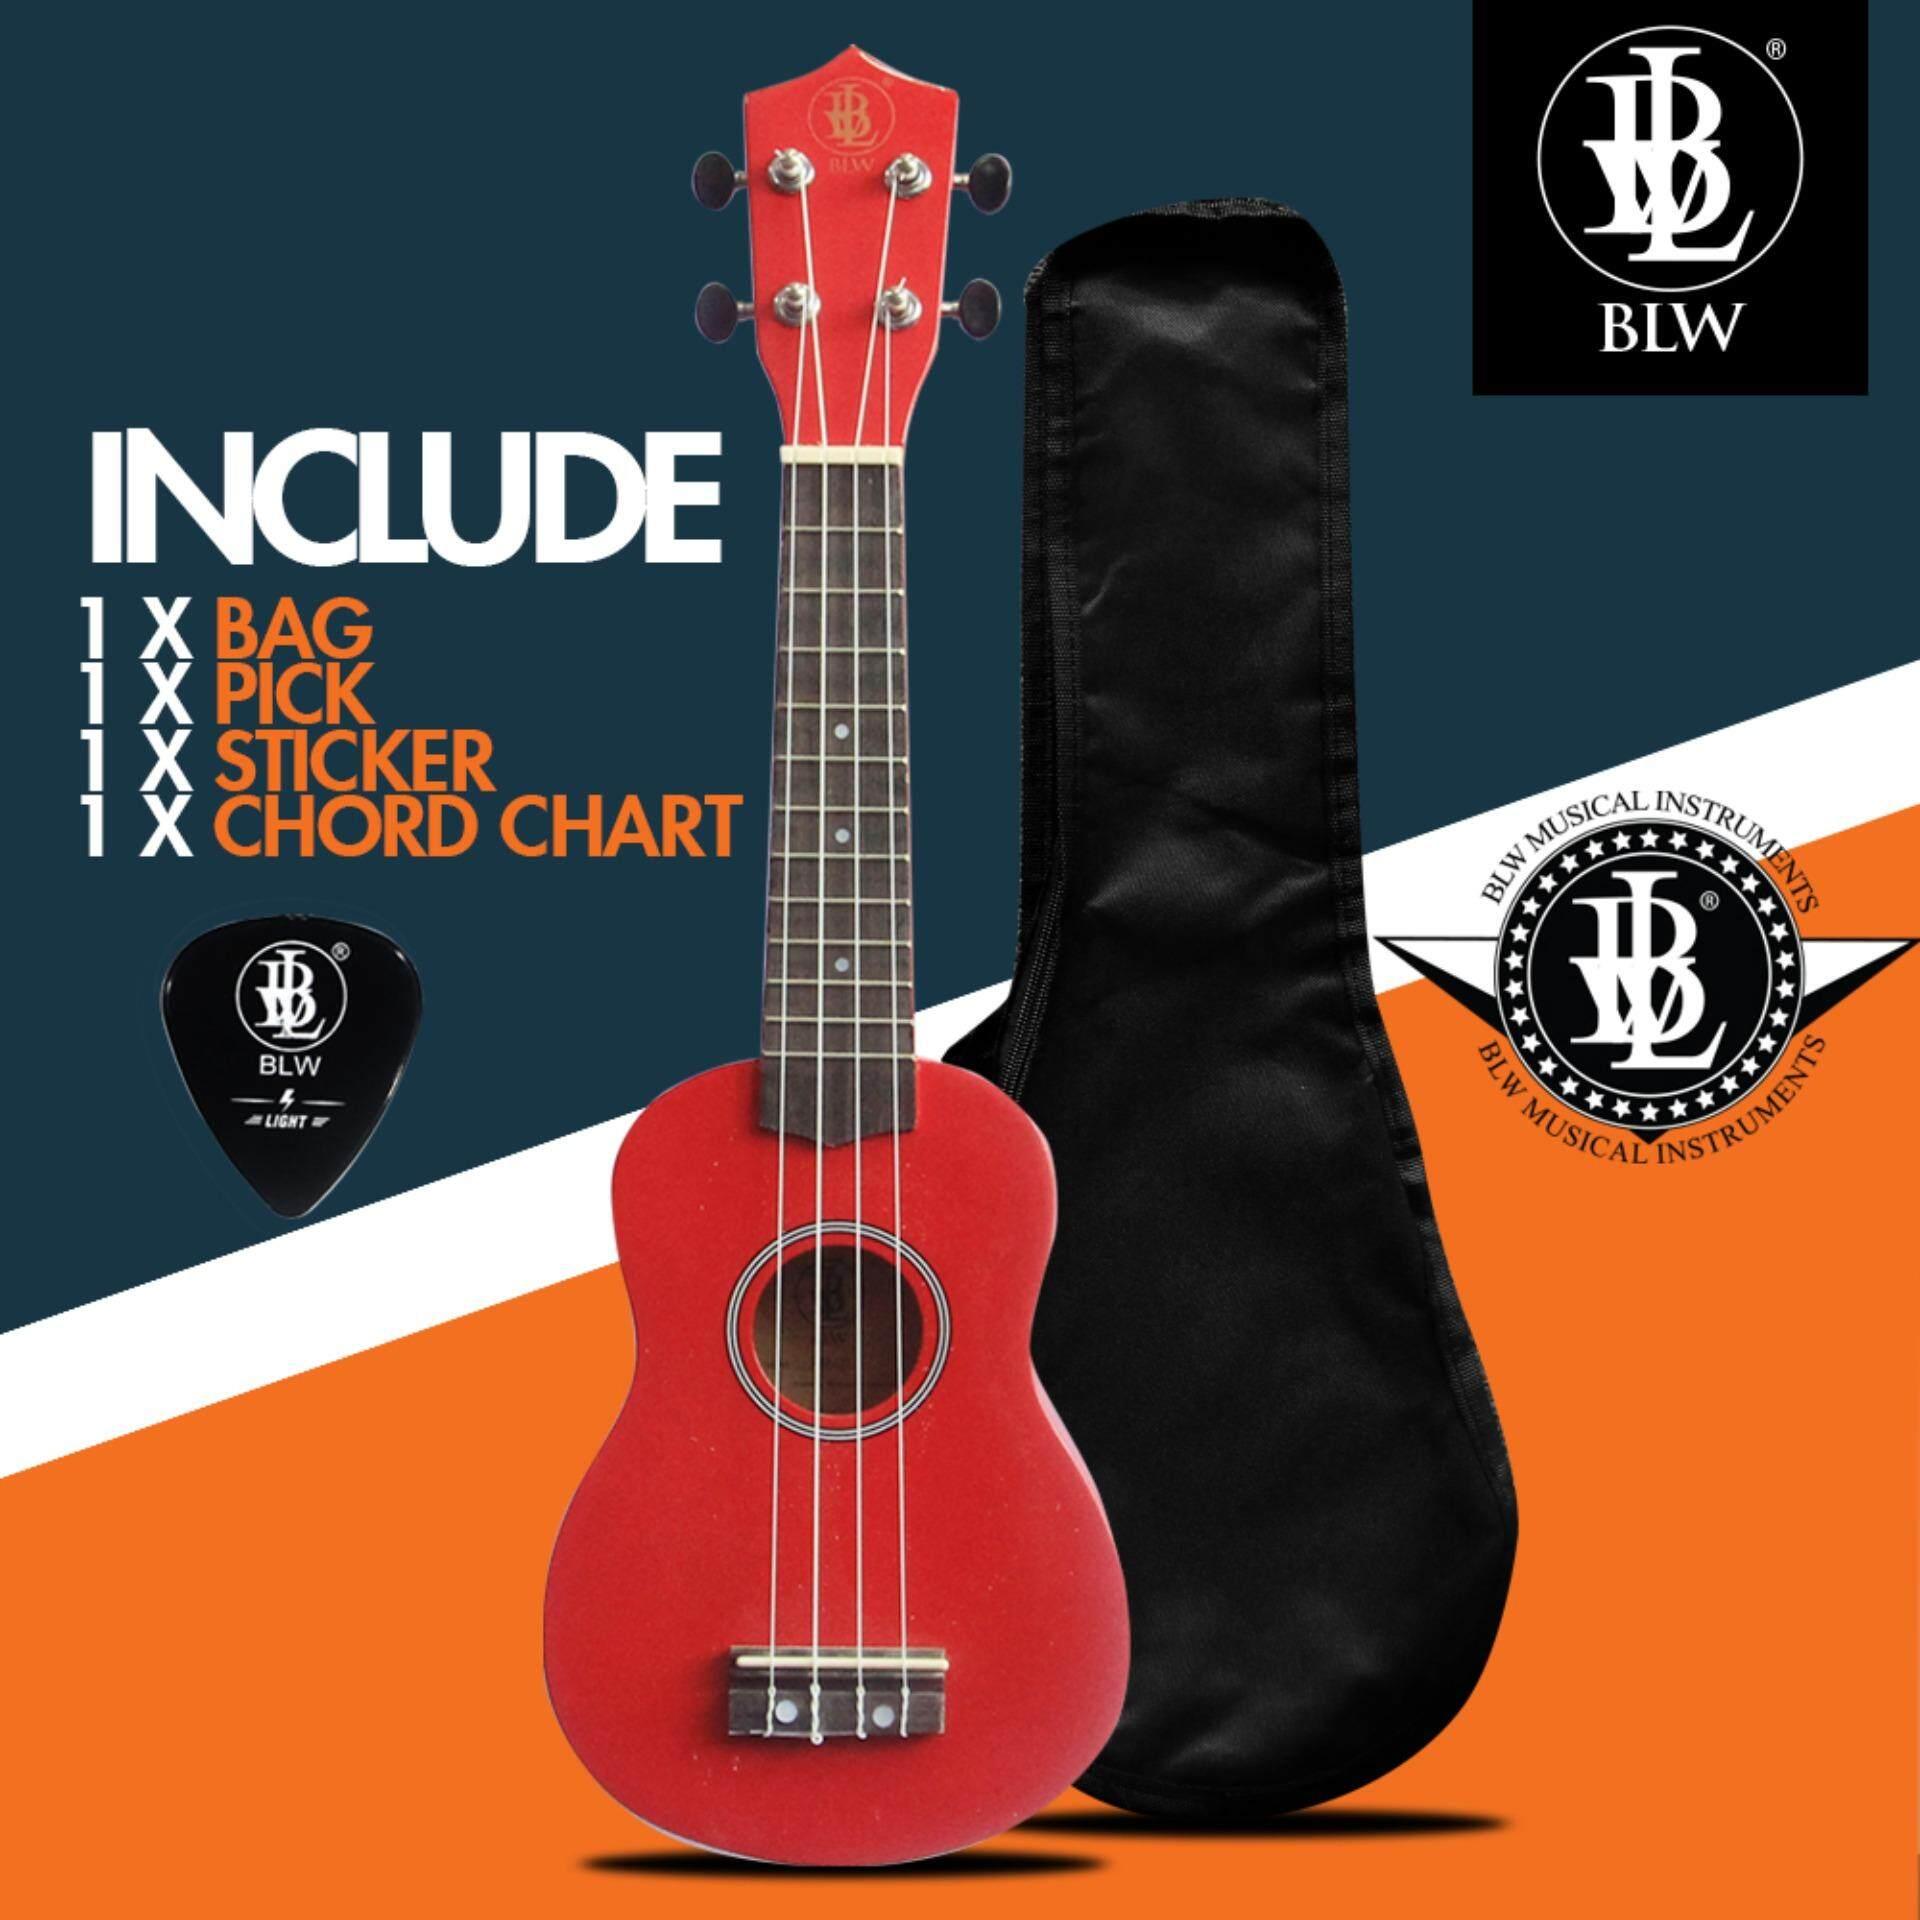 Blw 21 inch 4 nylon strings soprano ukulele hawaii guitar free blw 21 inch 4 nylon strings soprano ukulele hawaii guitar free chord chart pick sticker red lazada malaysia hexwebz Gallery